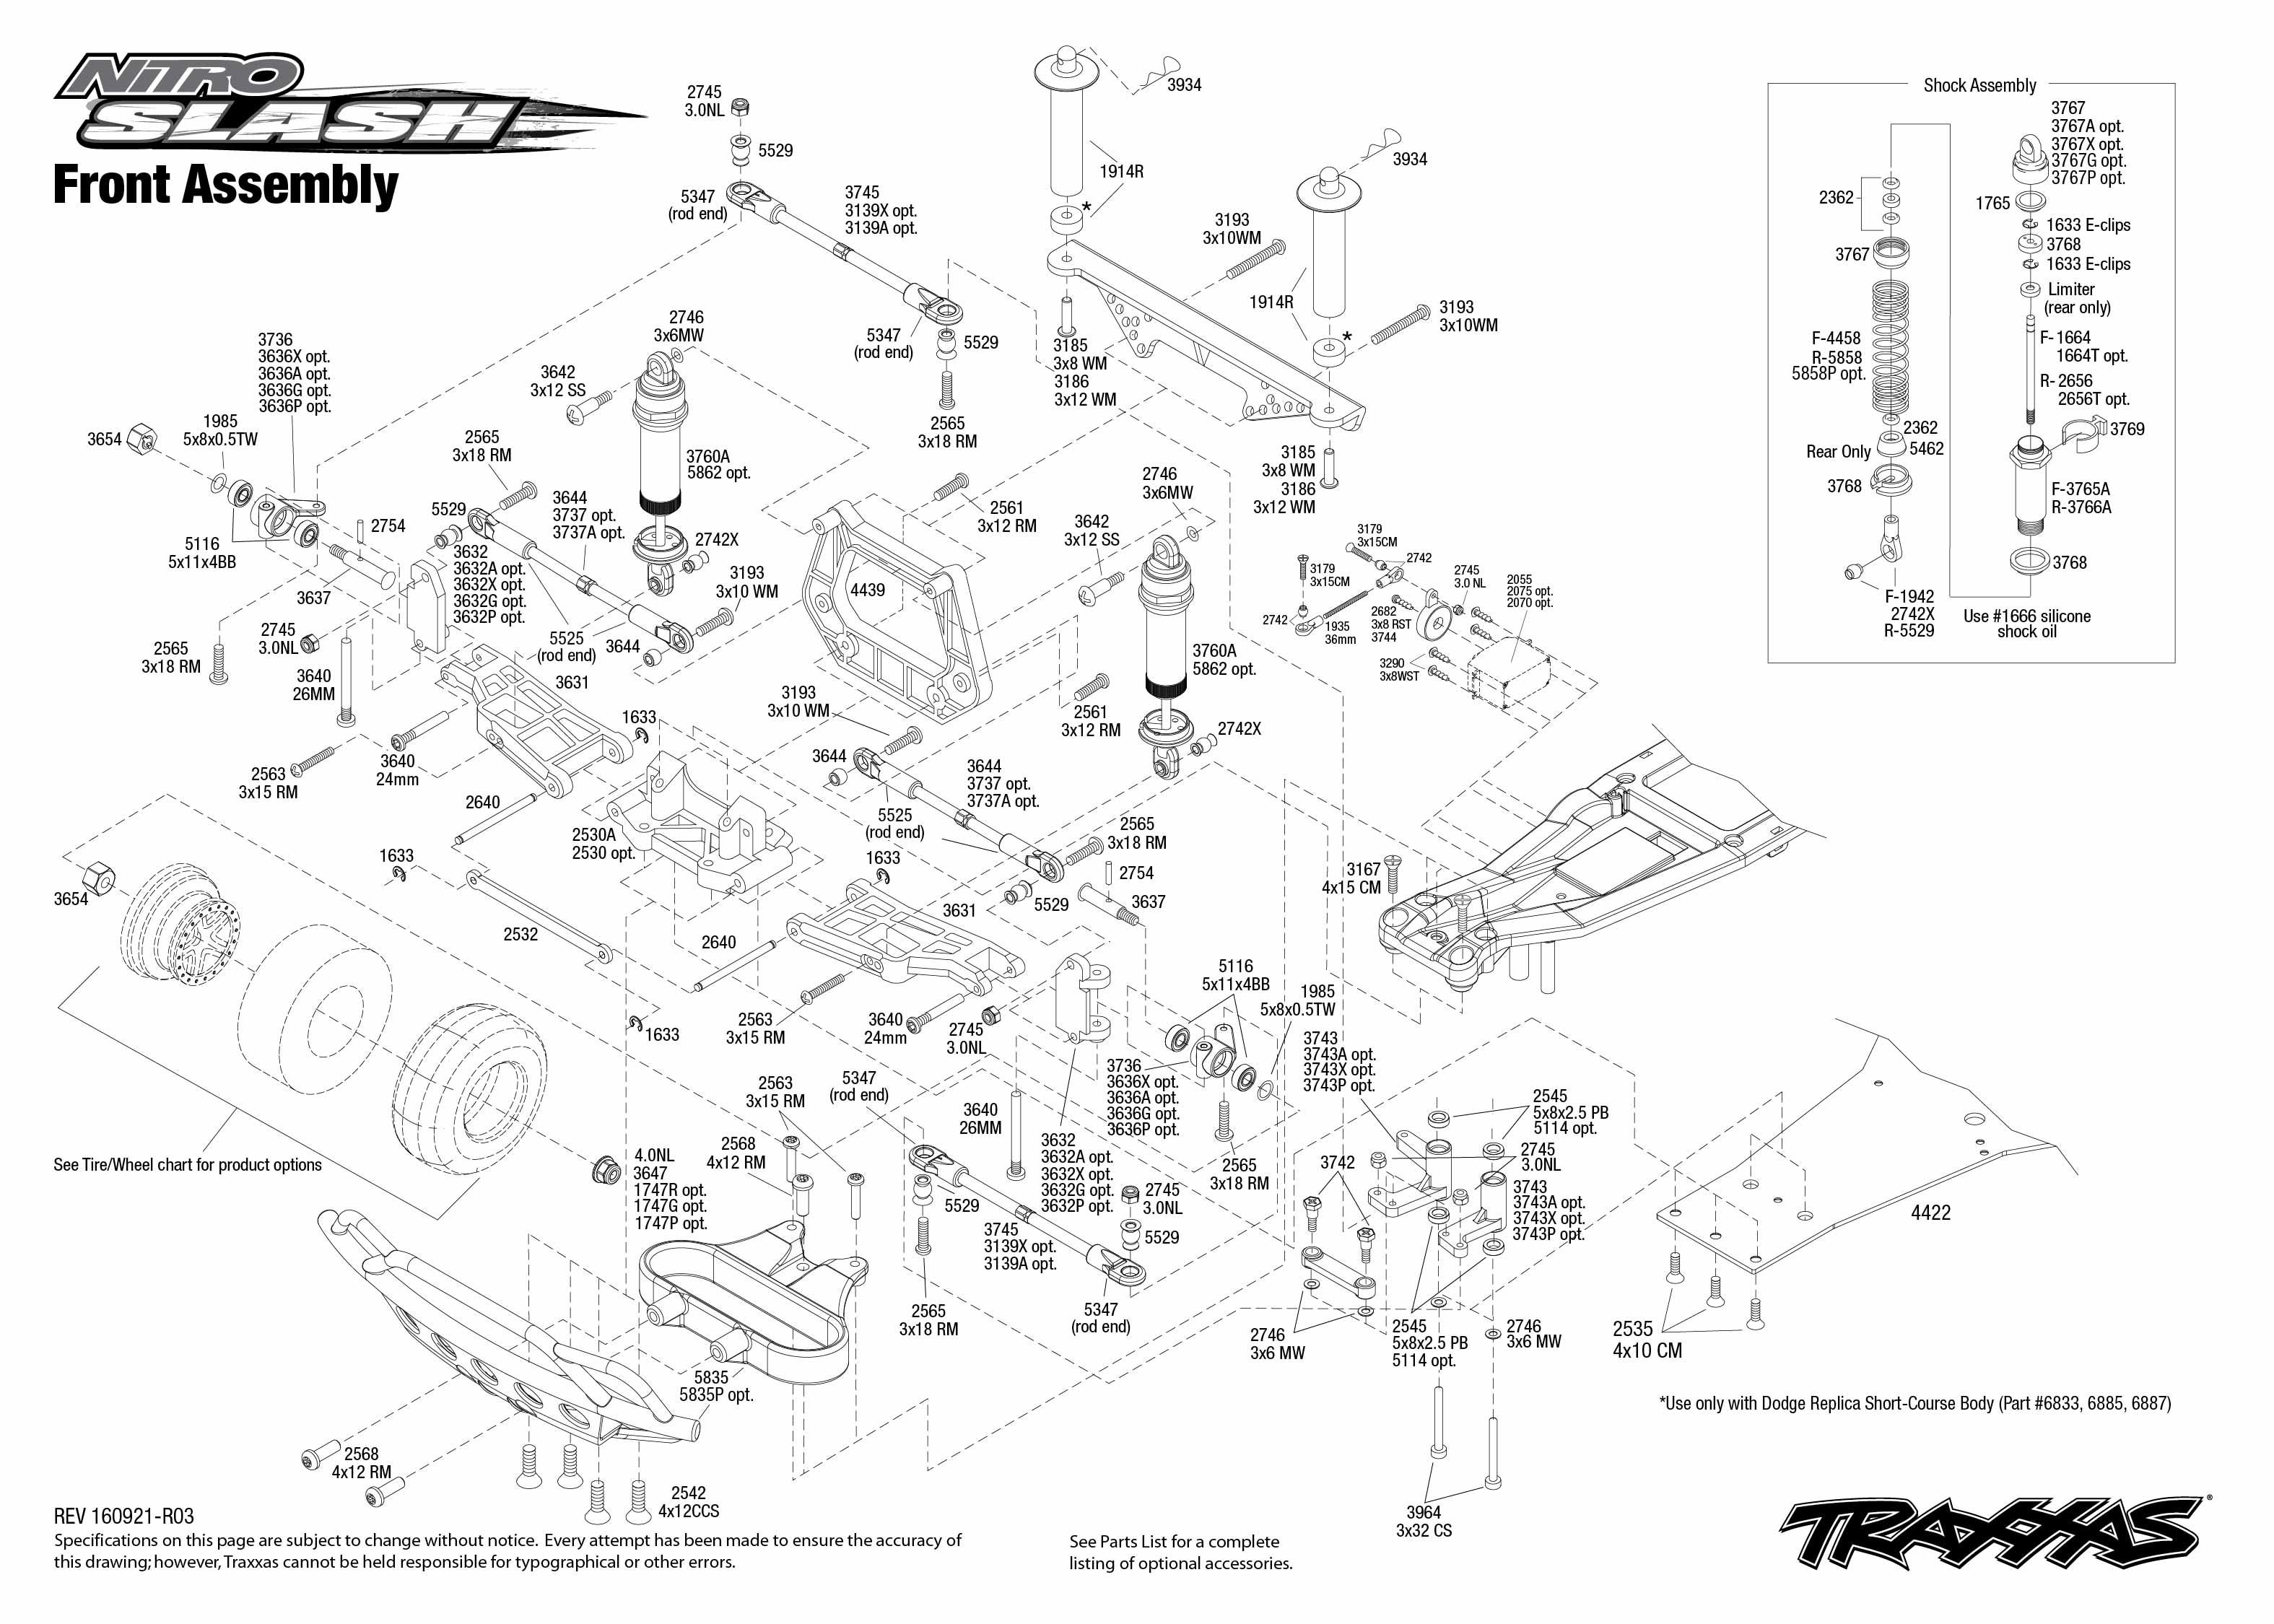 Suzuki Gn 125 H Wiring Diagram Schematic Diagrams 2002 Toyota Rav4l Exploded View Traxxas Nitro Slash 1 10 Tqi Rtr Tsm Front Part Astra Tapas La Unidad De